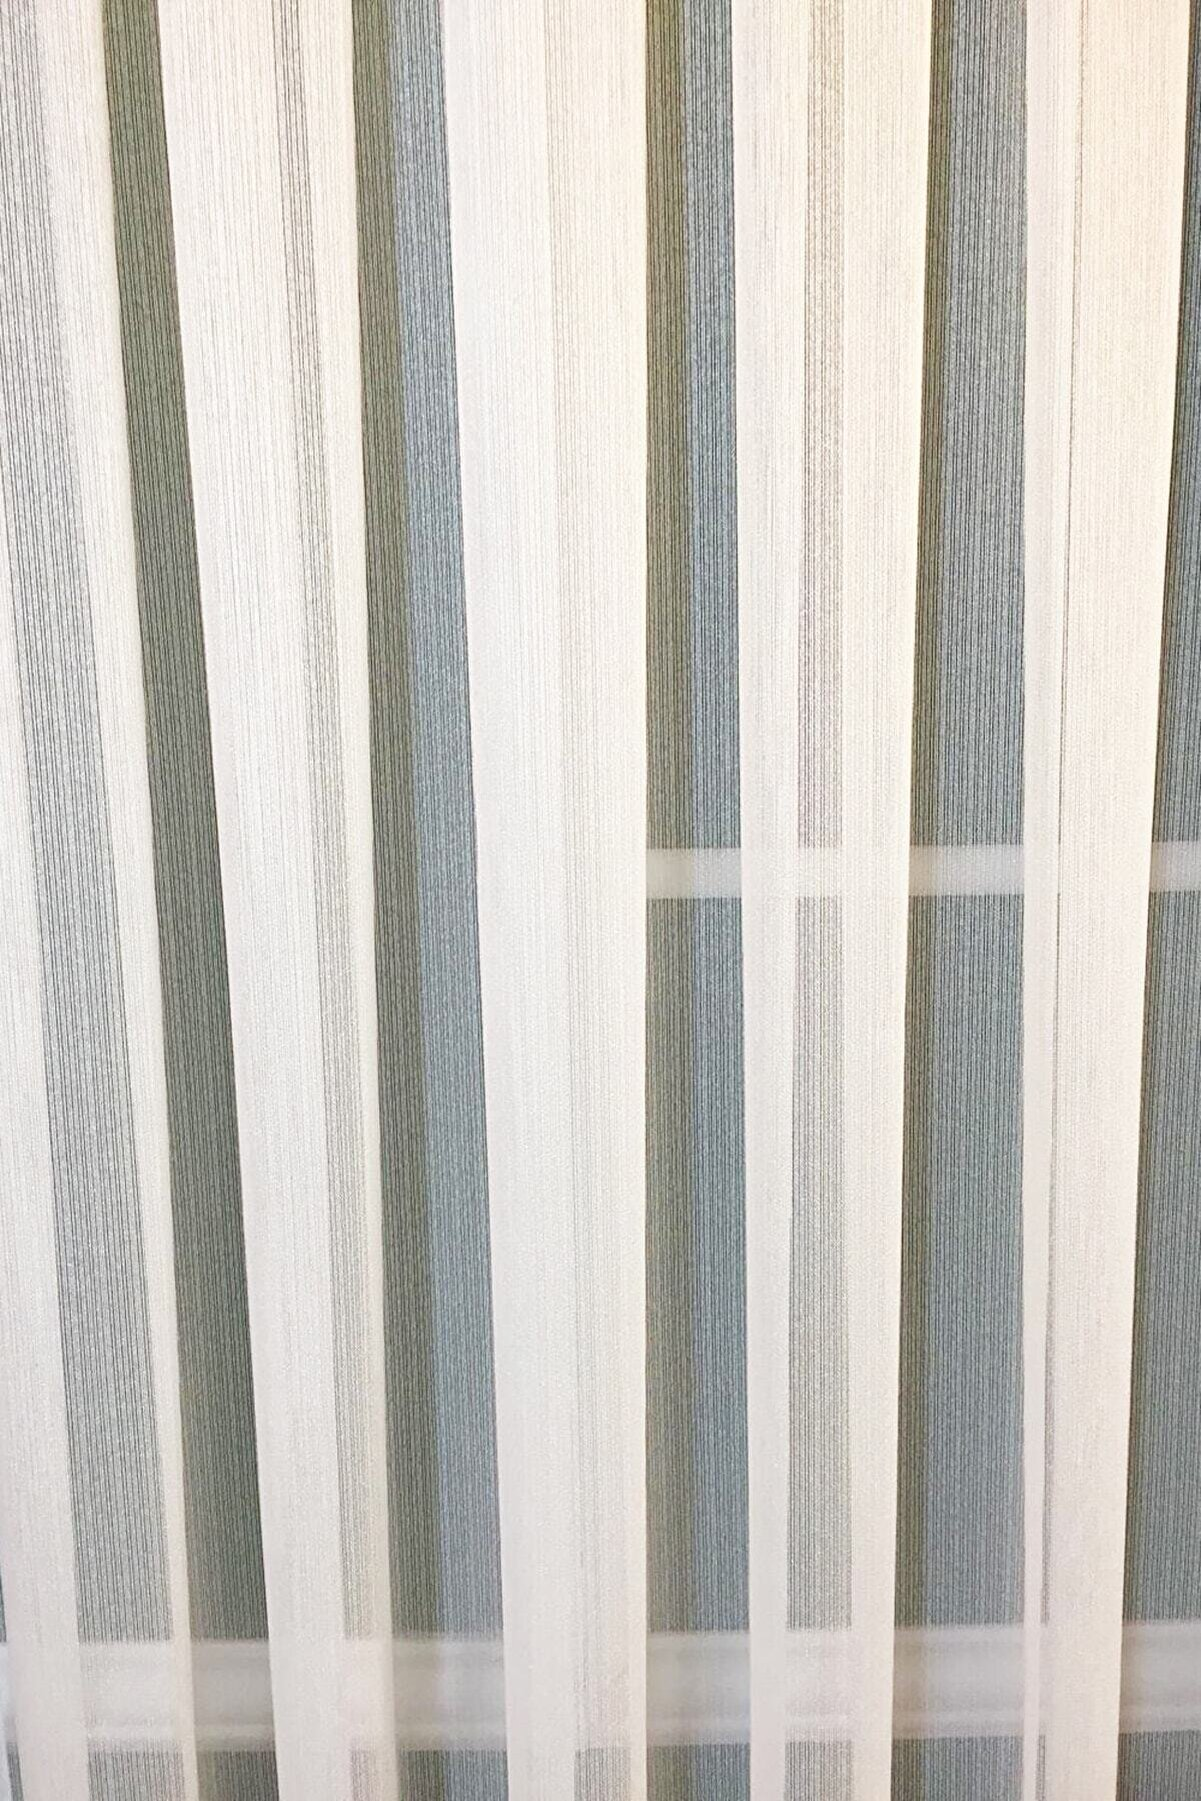 Linens 250x260 Doğa Perde Ince Çizgili 1 X 3 Pile Tül Perde